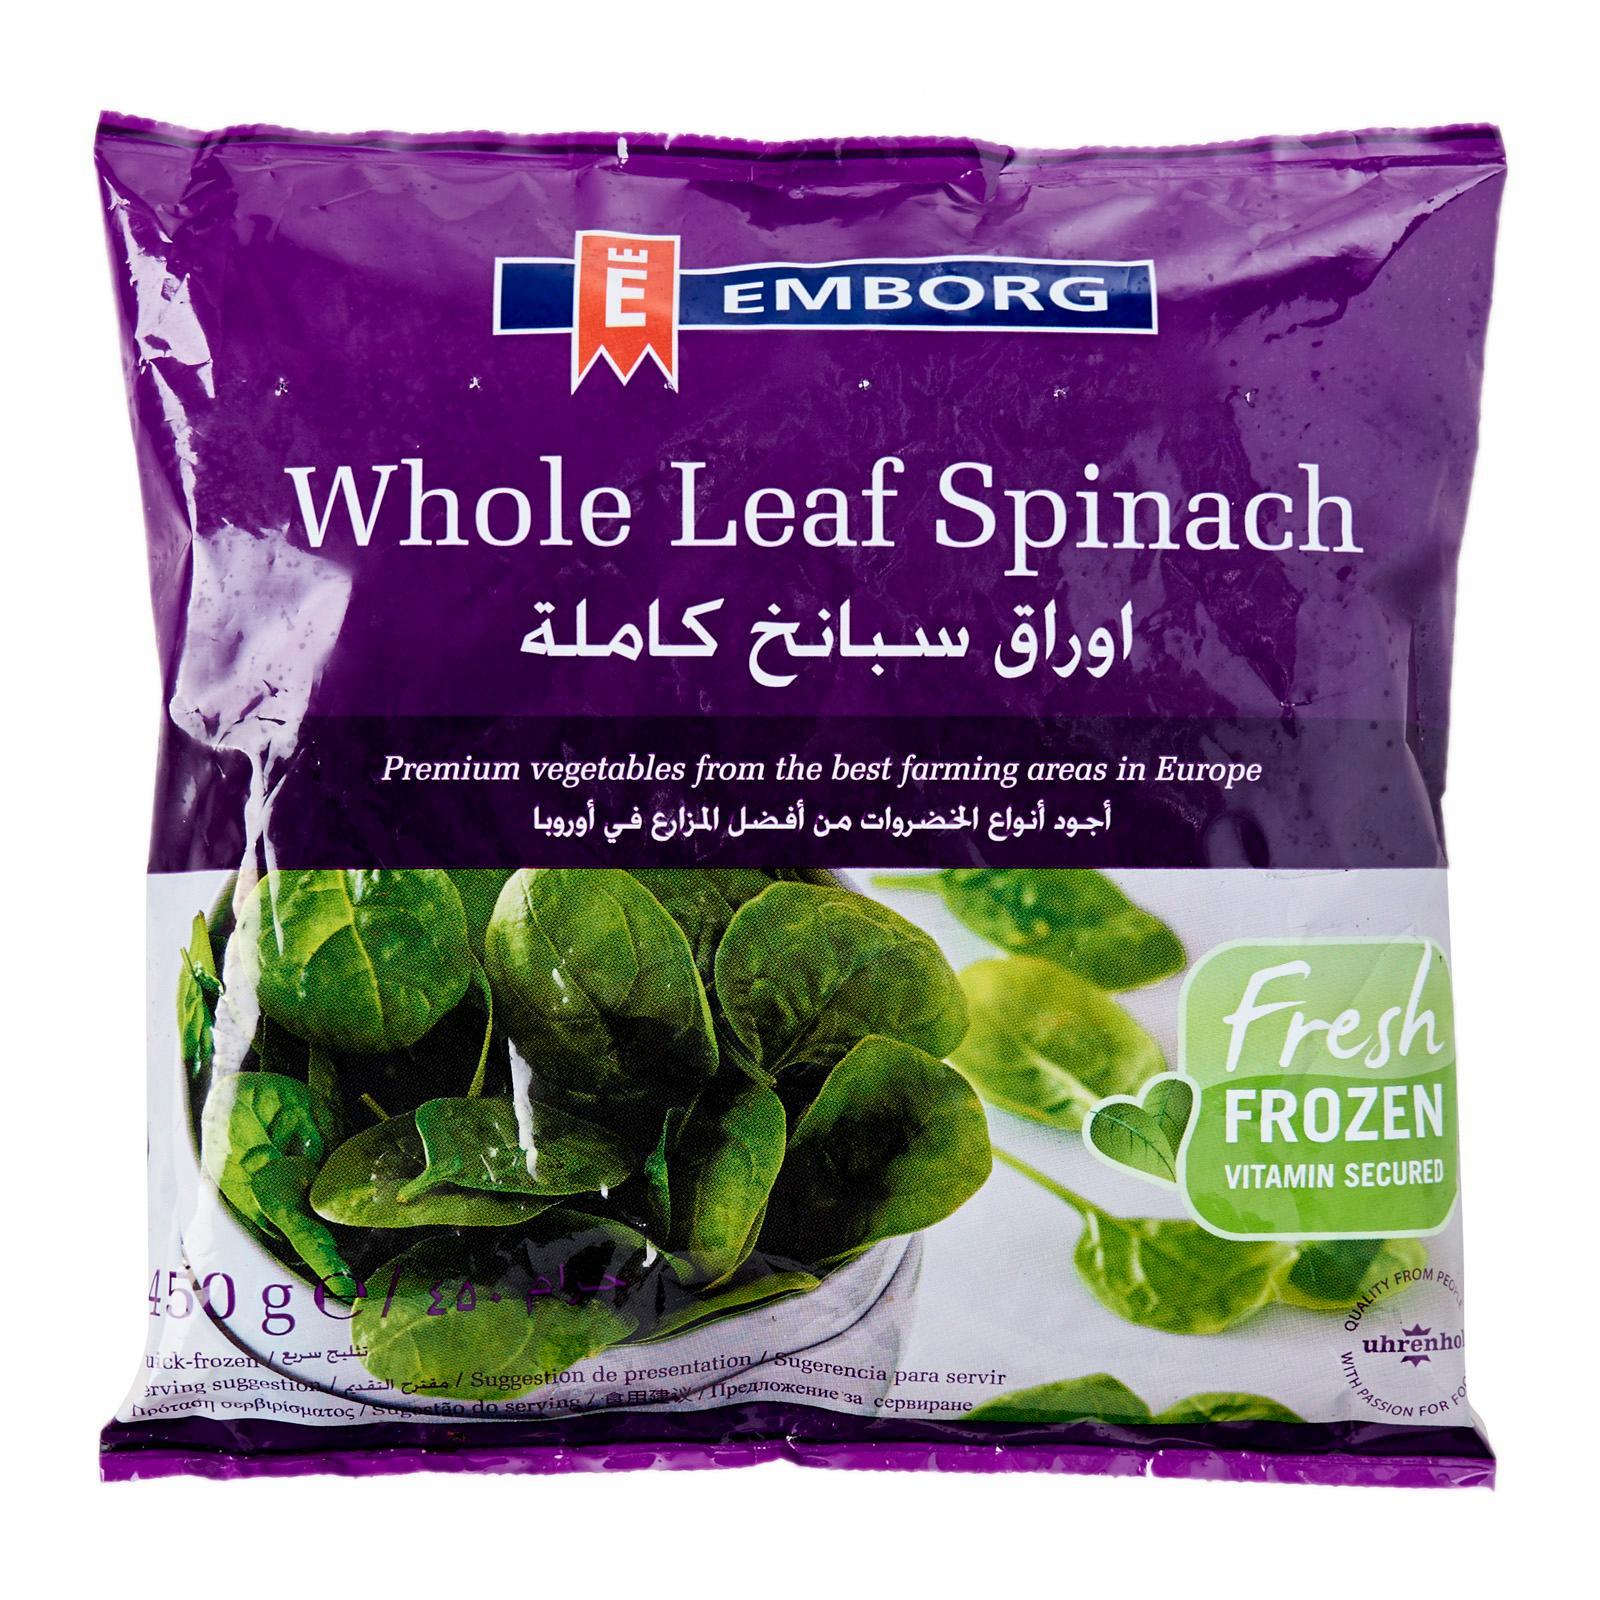 Emborg Whole Leaf Spinach - Frozen By Redmart.